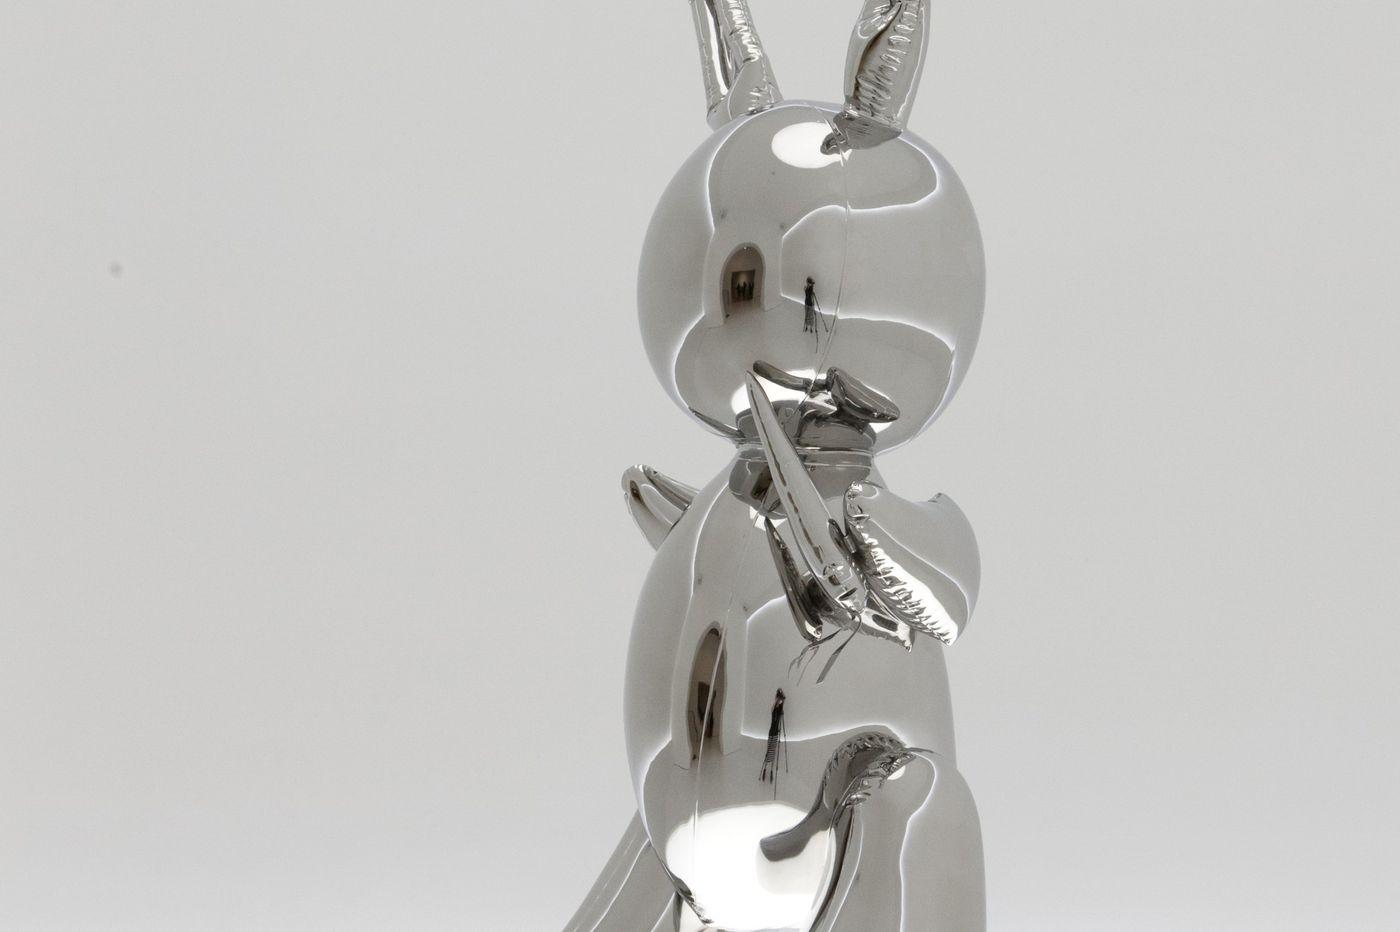 Jeff Koons 'Rabbit' sculpture sets €81.4 million record at sale